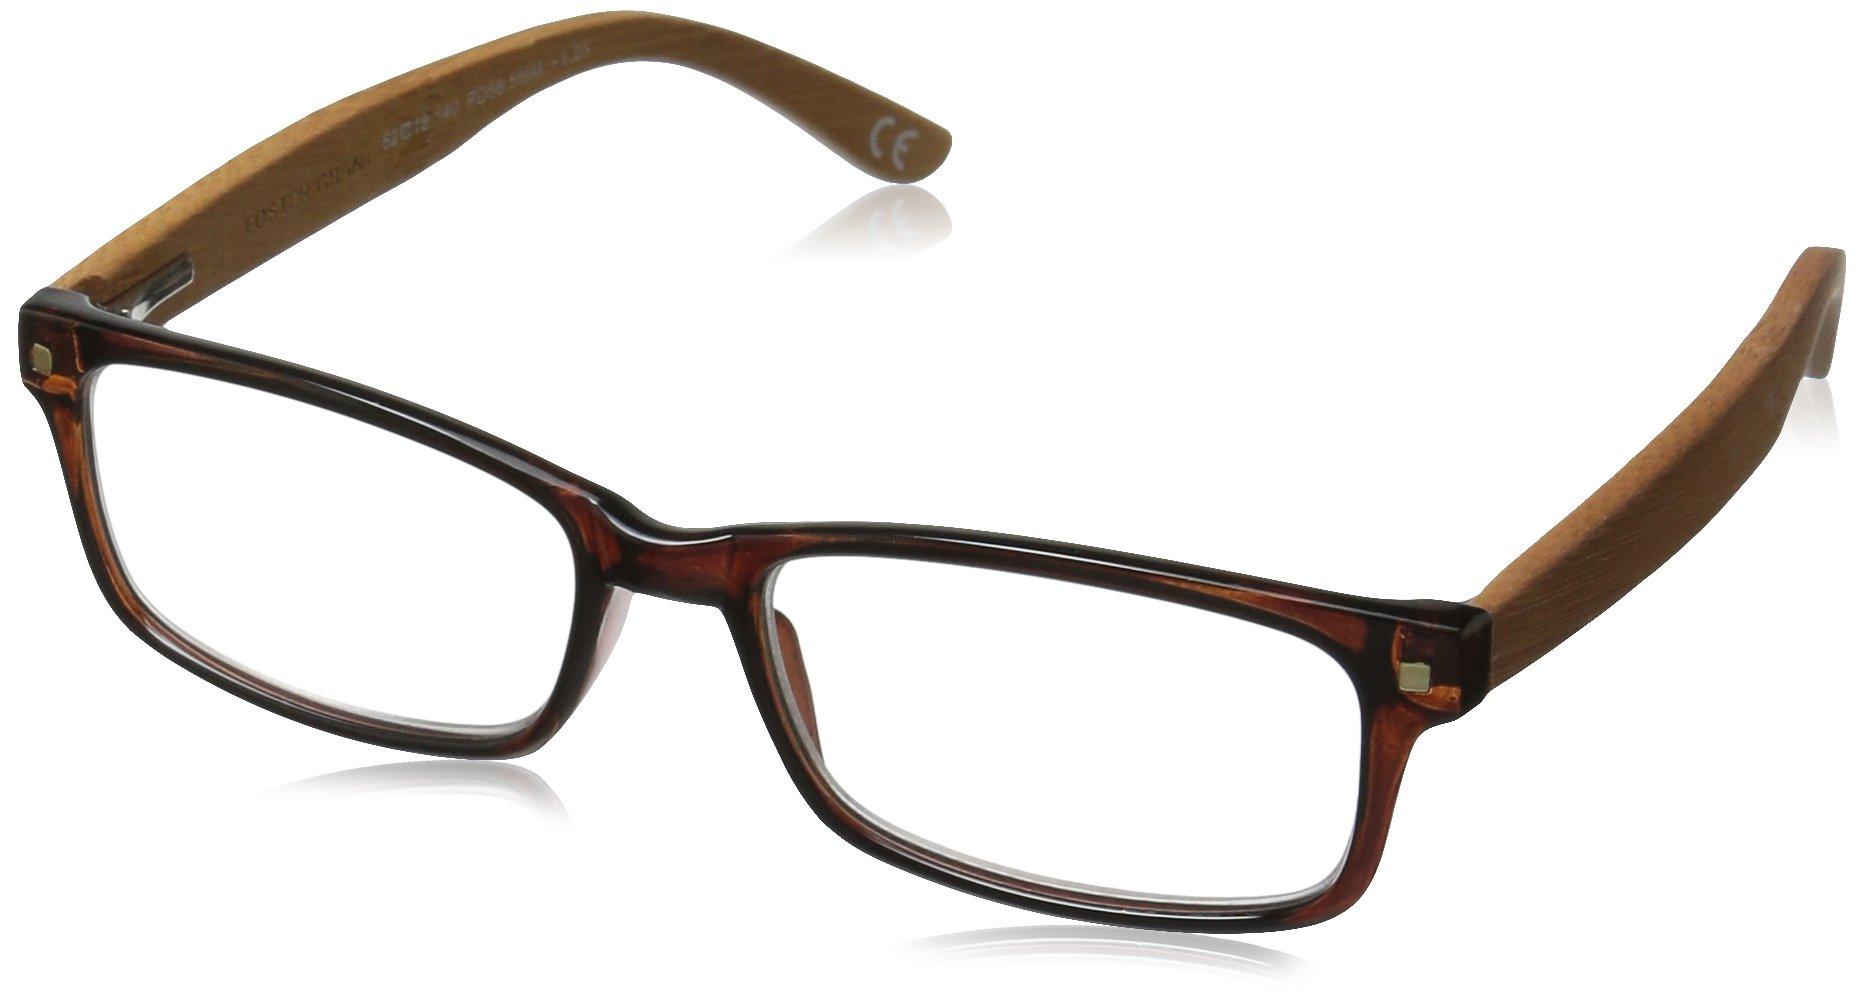 Foster Grant Men's Angus 1017560-175.COM Wayfarer Reading Glasses, Brown, 1.75